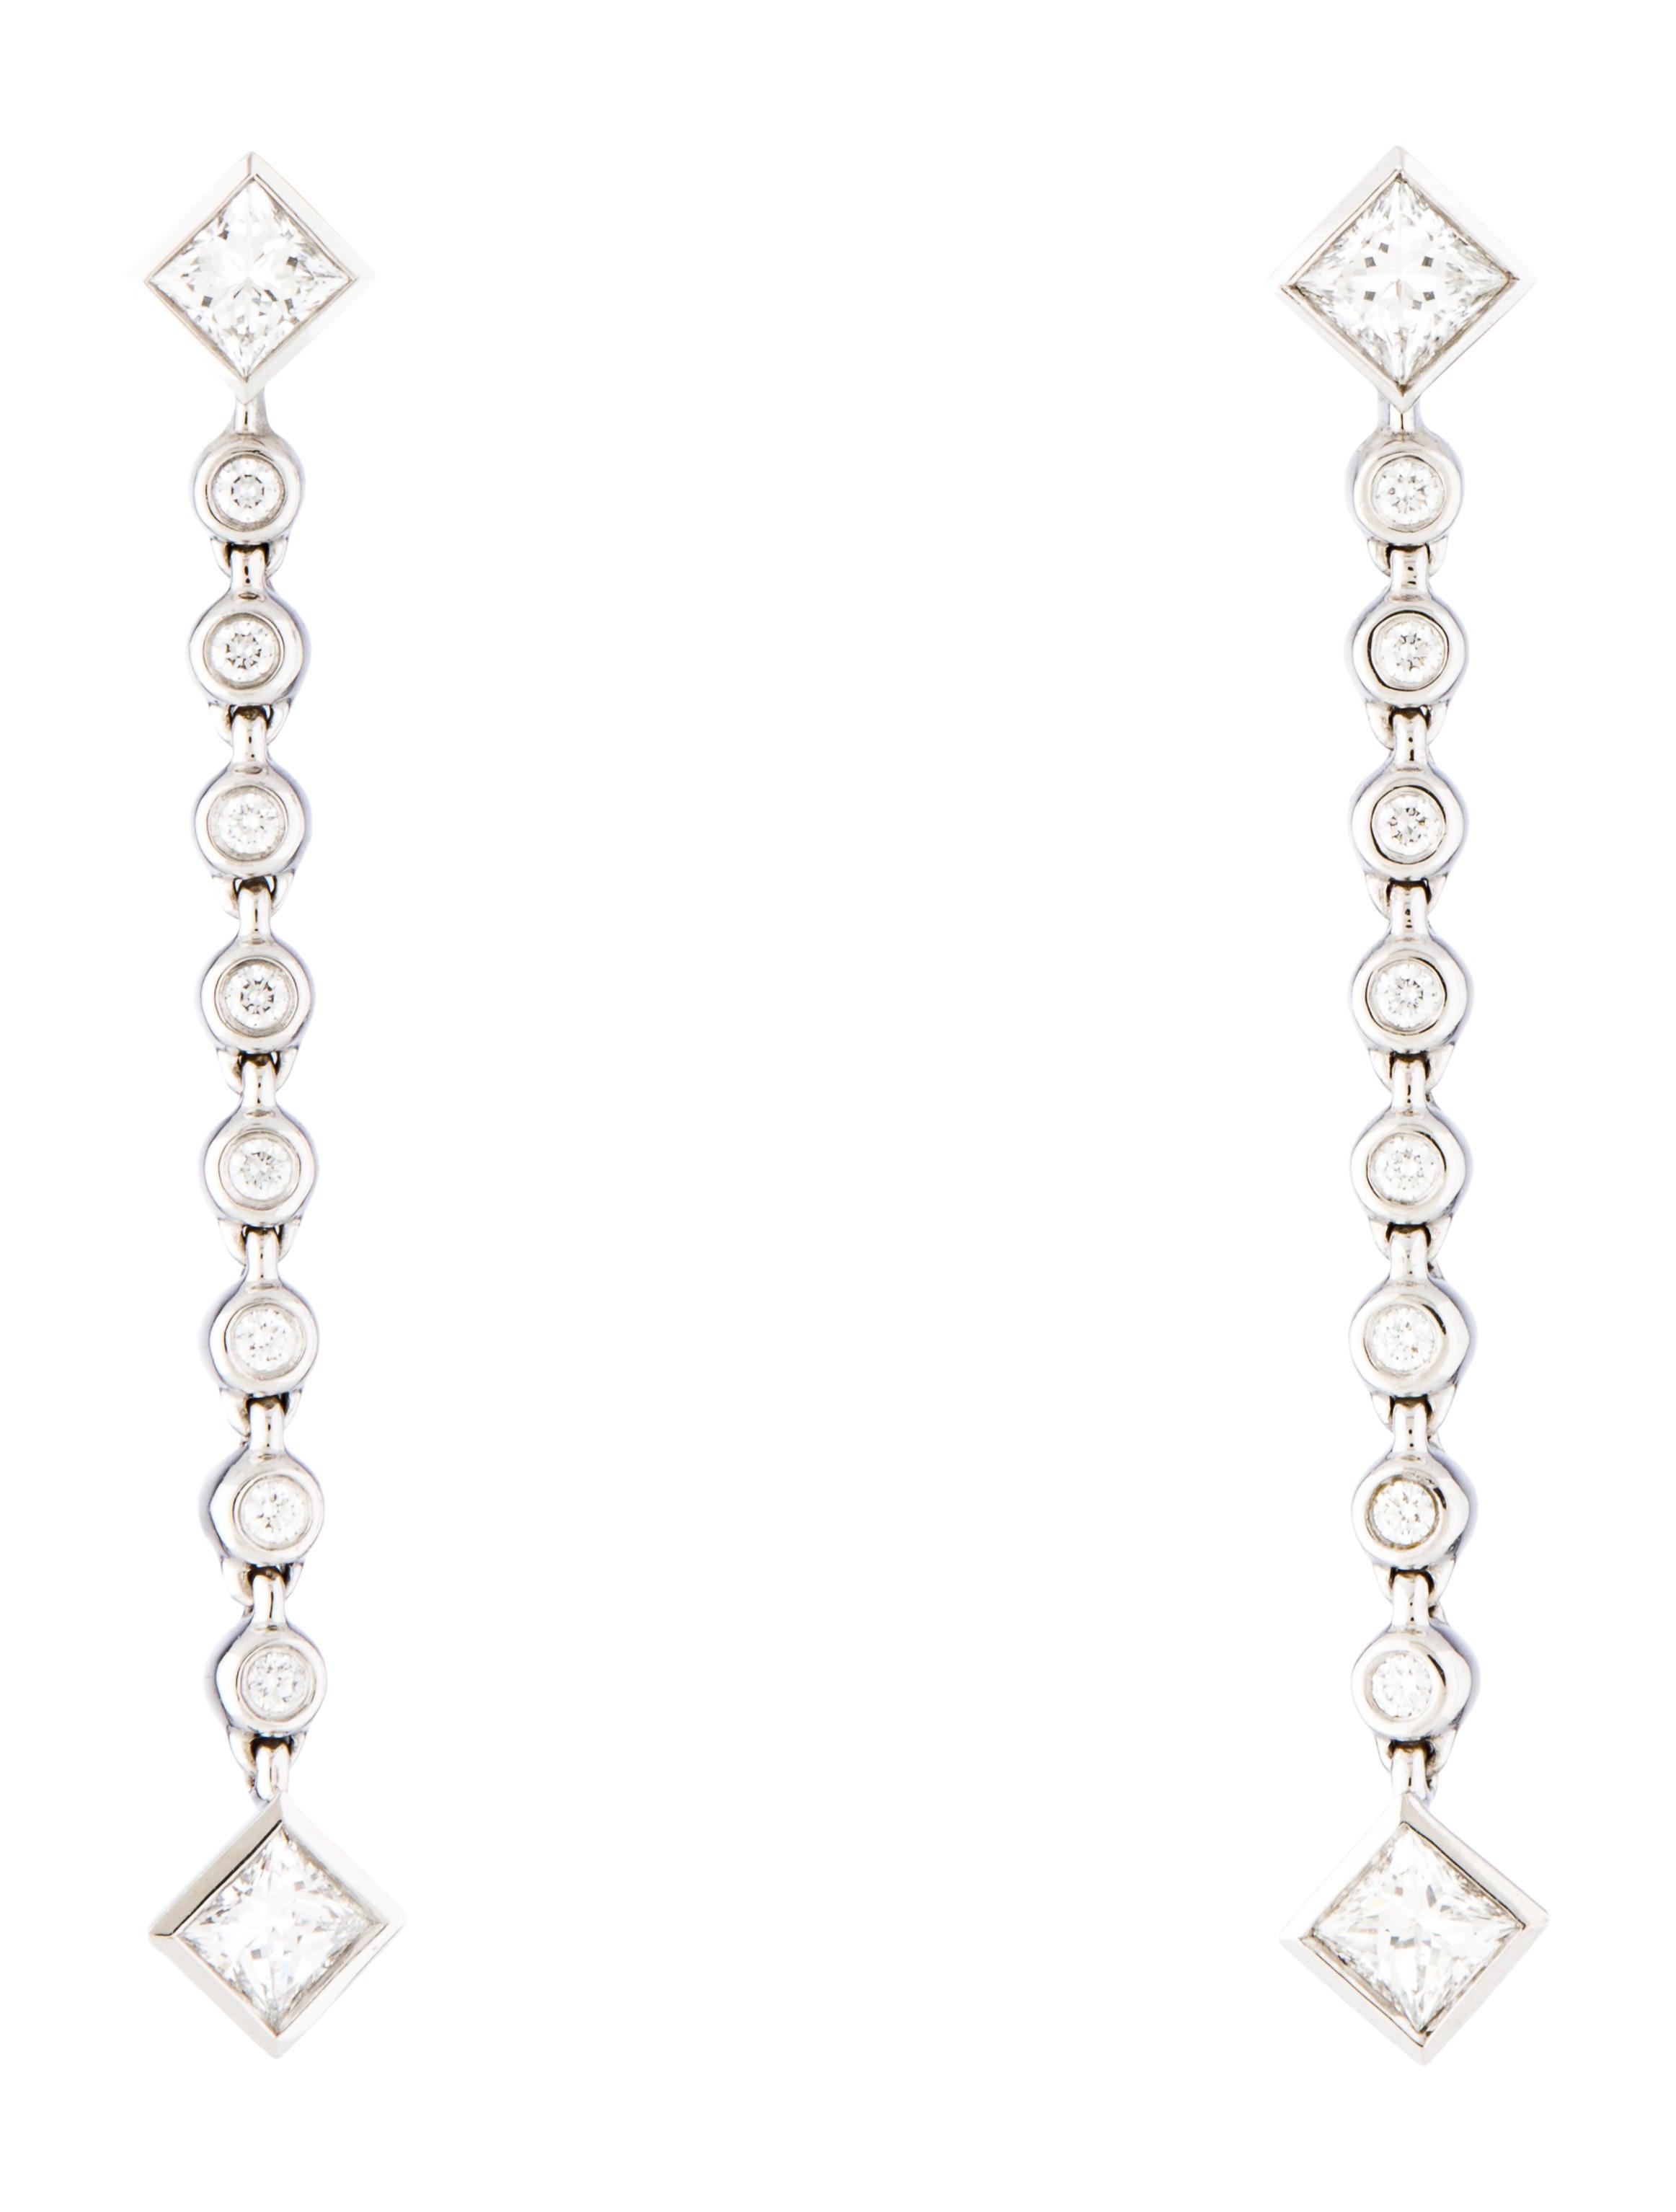 e2f29454e Tiffany & Co. Platinum Diamond Grace Earrings - Earrings - TIF72934 ...